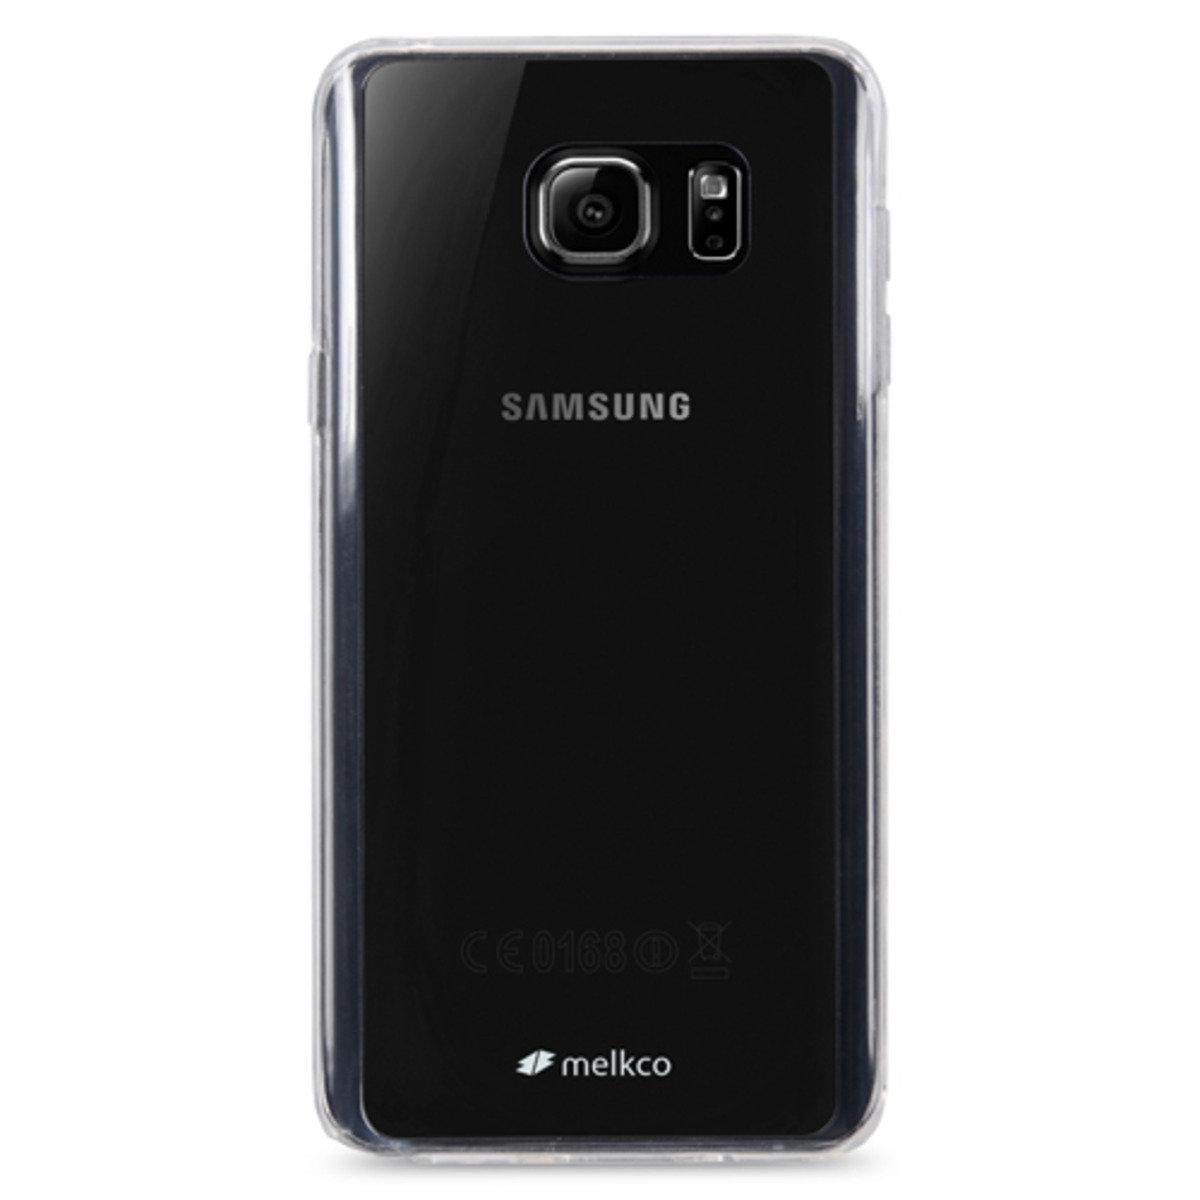 Galaxy Note 5 PolyUltima手機保護殼 - 透明色(附送屏幕保護貼)